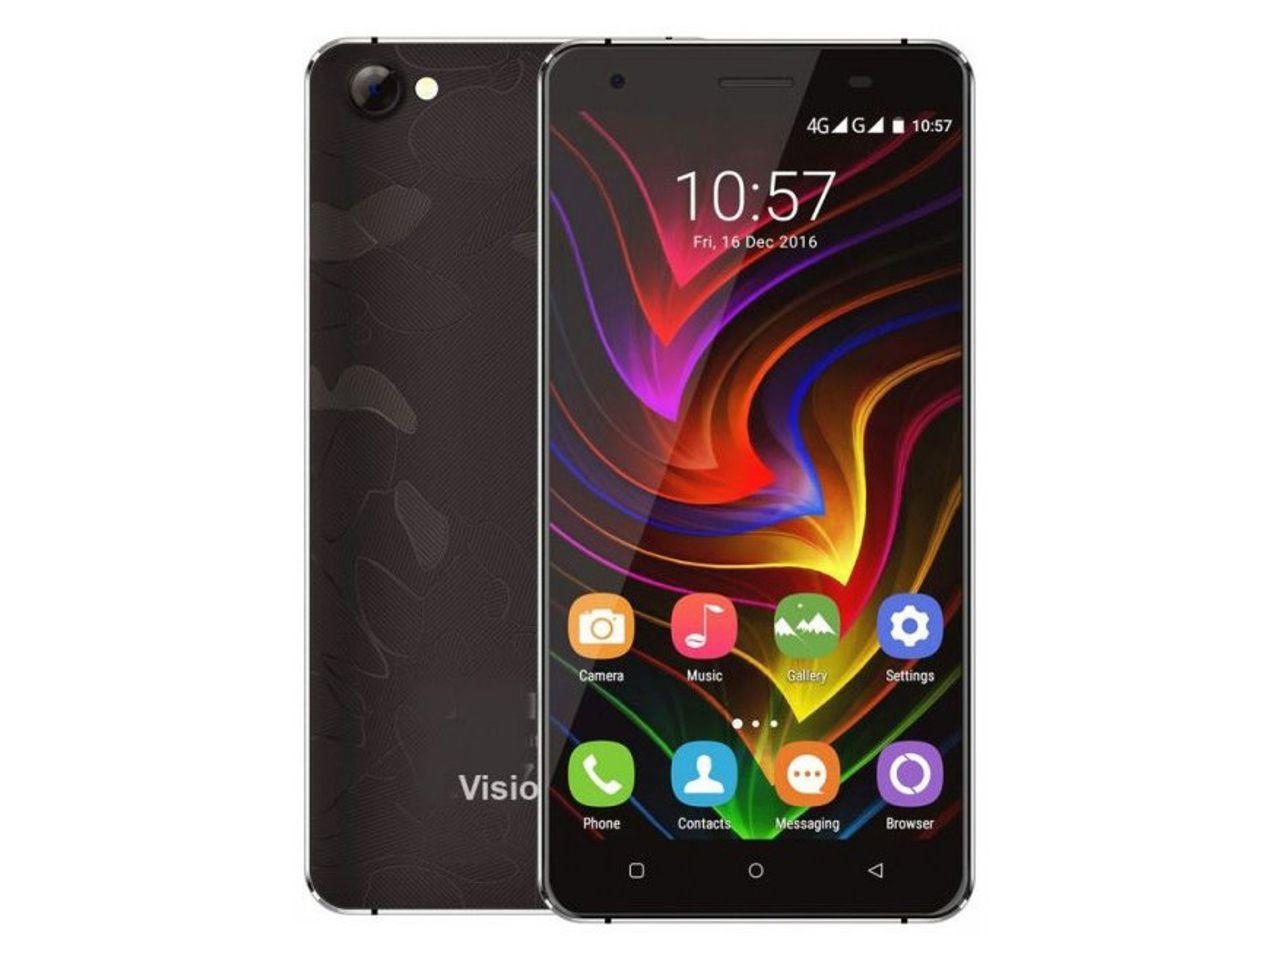 UMAX VisionBook P50 Plus LTE, 8 GB, Dual SIM, černý, CZ distribuce | CHAT on-line podpora PO-PÁ 8-22.00!!